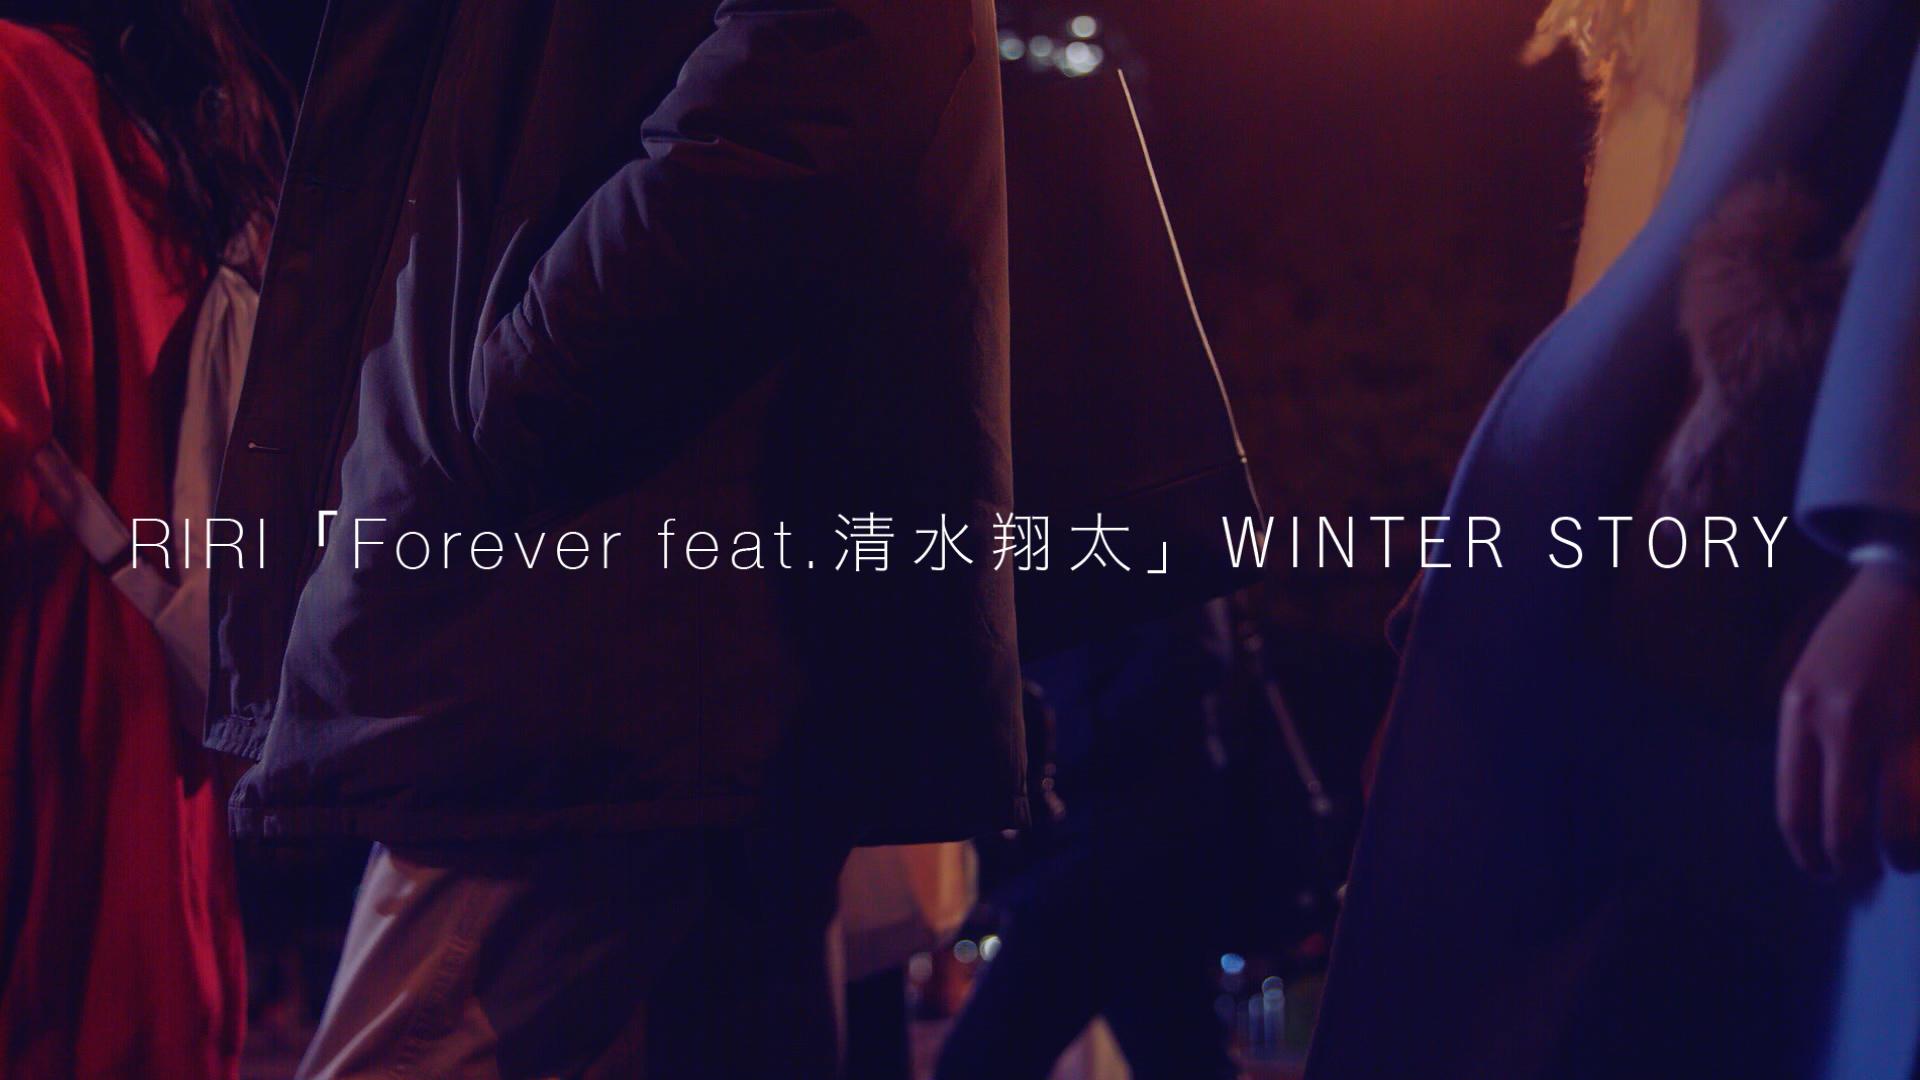 Riri X Shota Shimizu的合作在横滨红砖仓库支持 双手情感 手海报